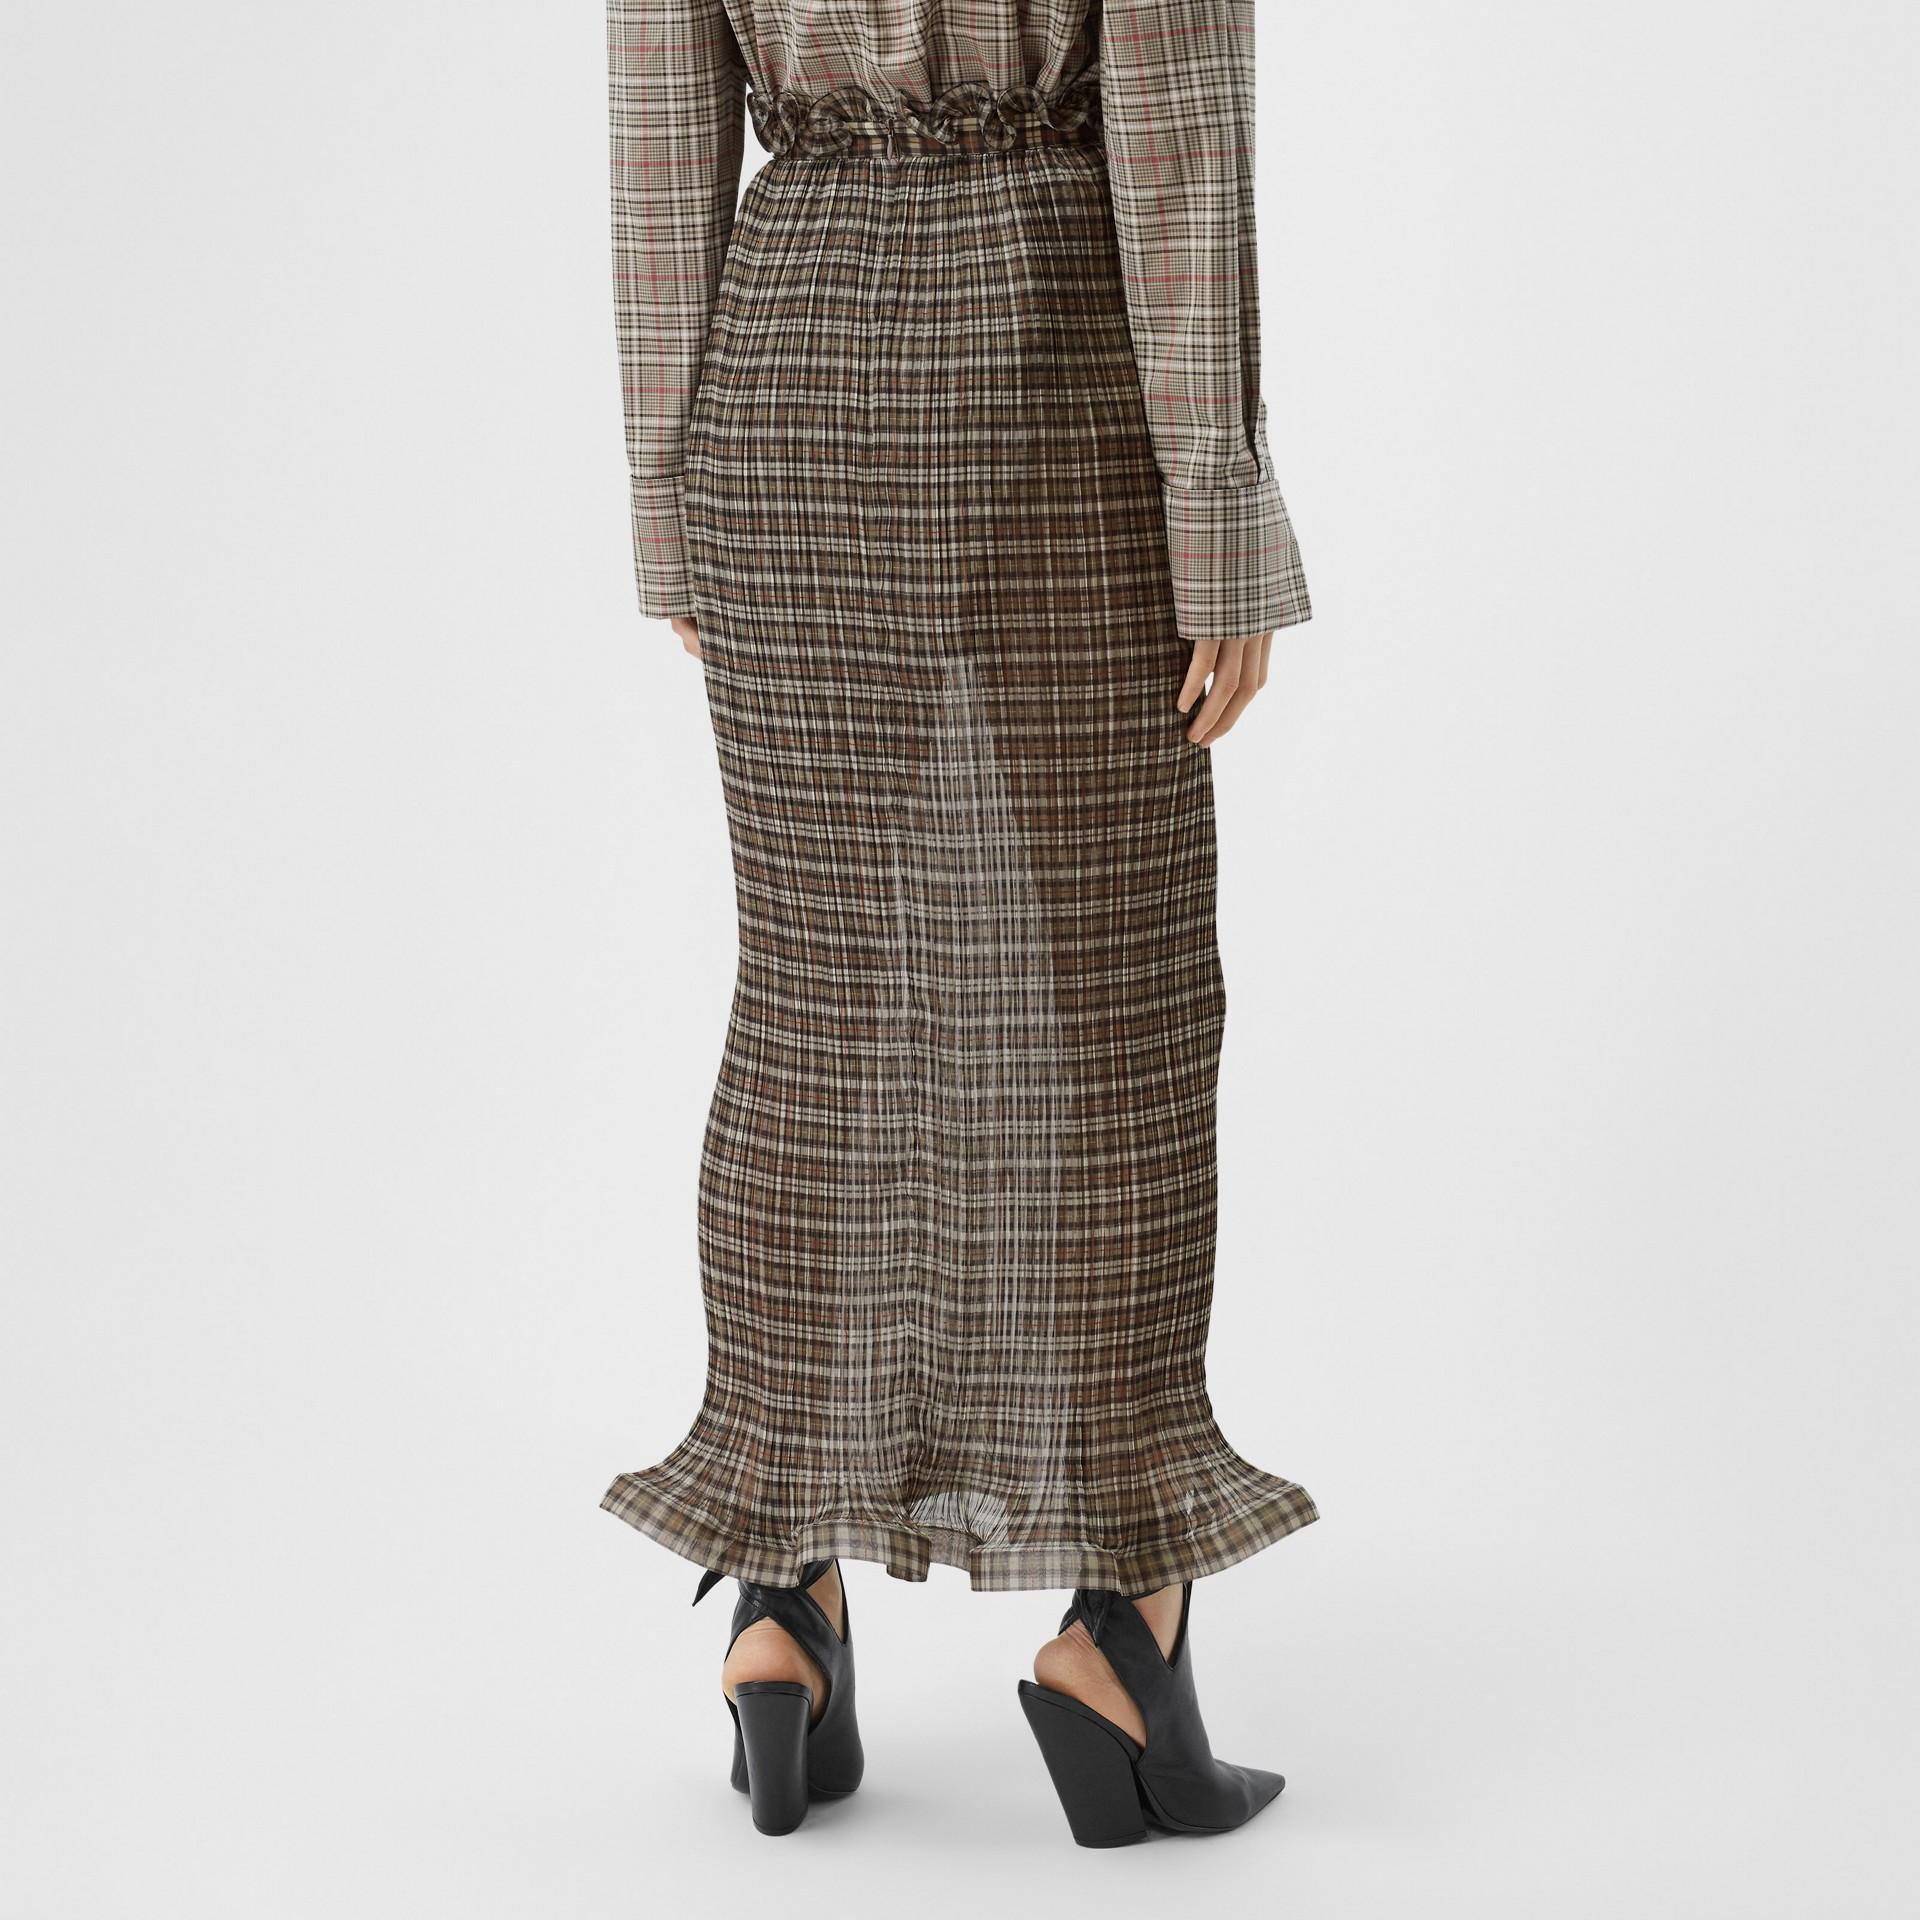 Custom Fit Ruffle Detail Check Chiffon Plissé Skirt in Mahogany - Women | Burberry - gallery image 2